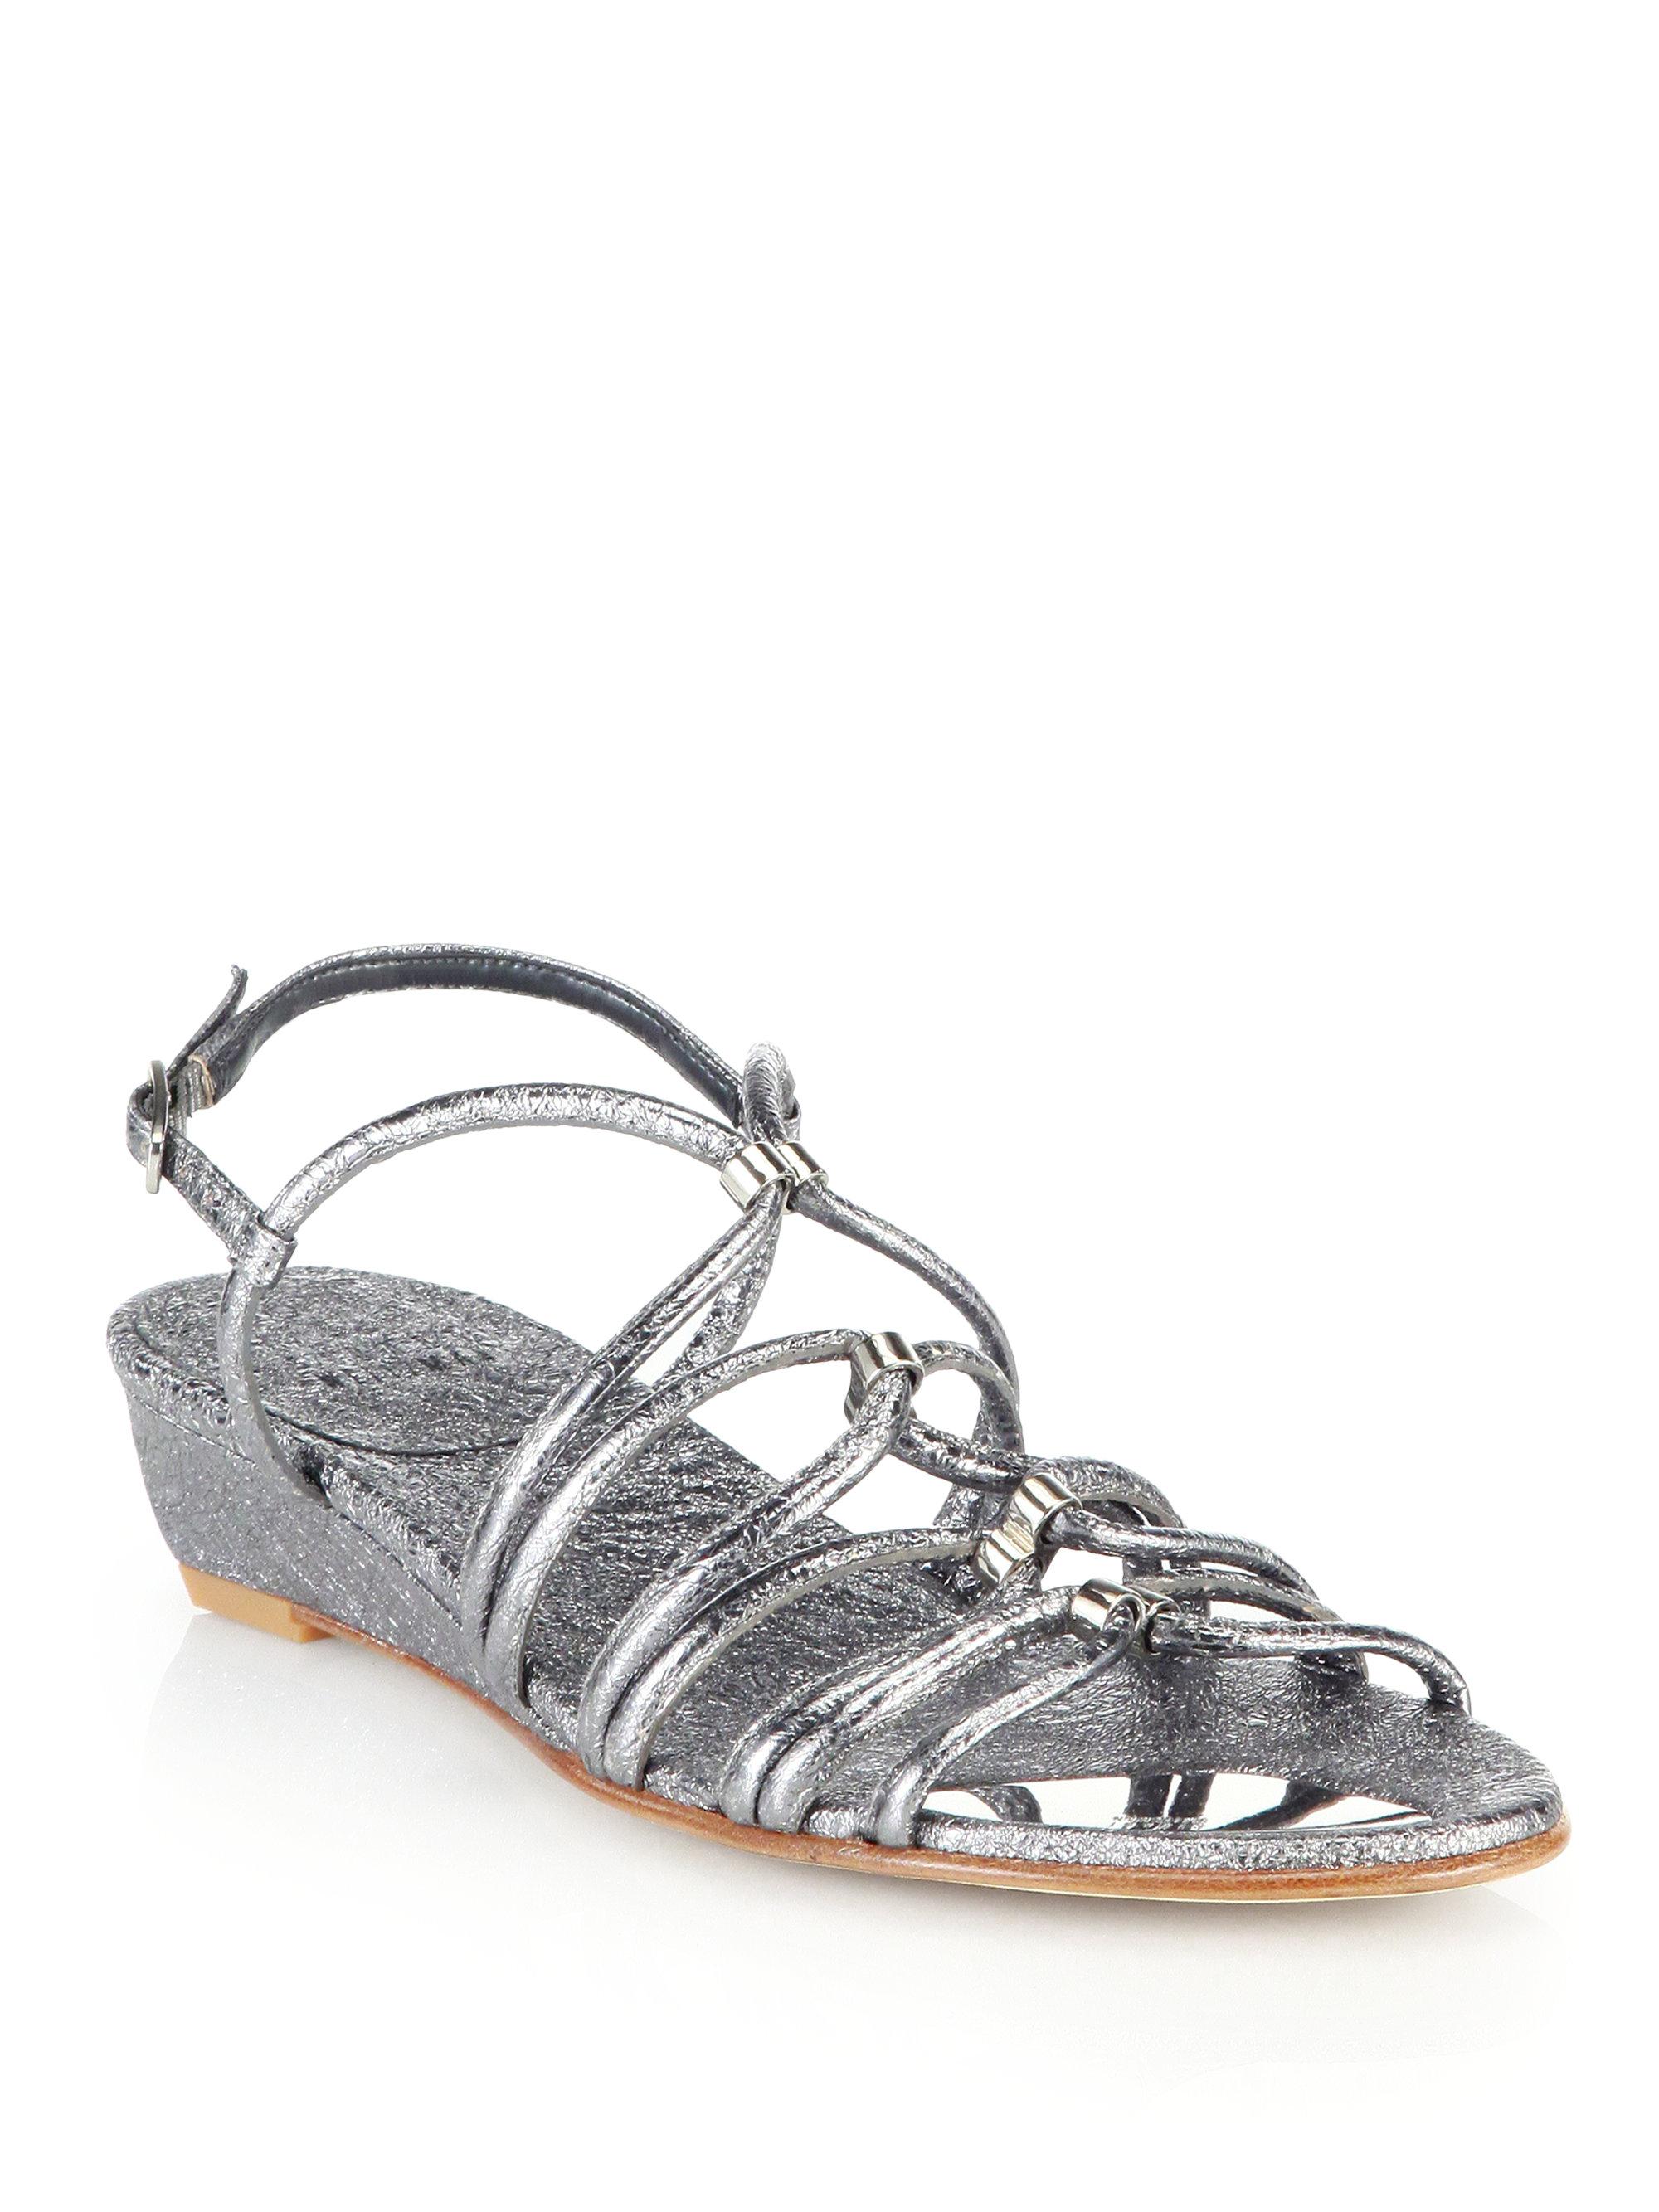 Stuart Weitzman Leather Flip Flops